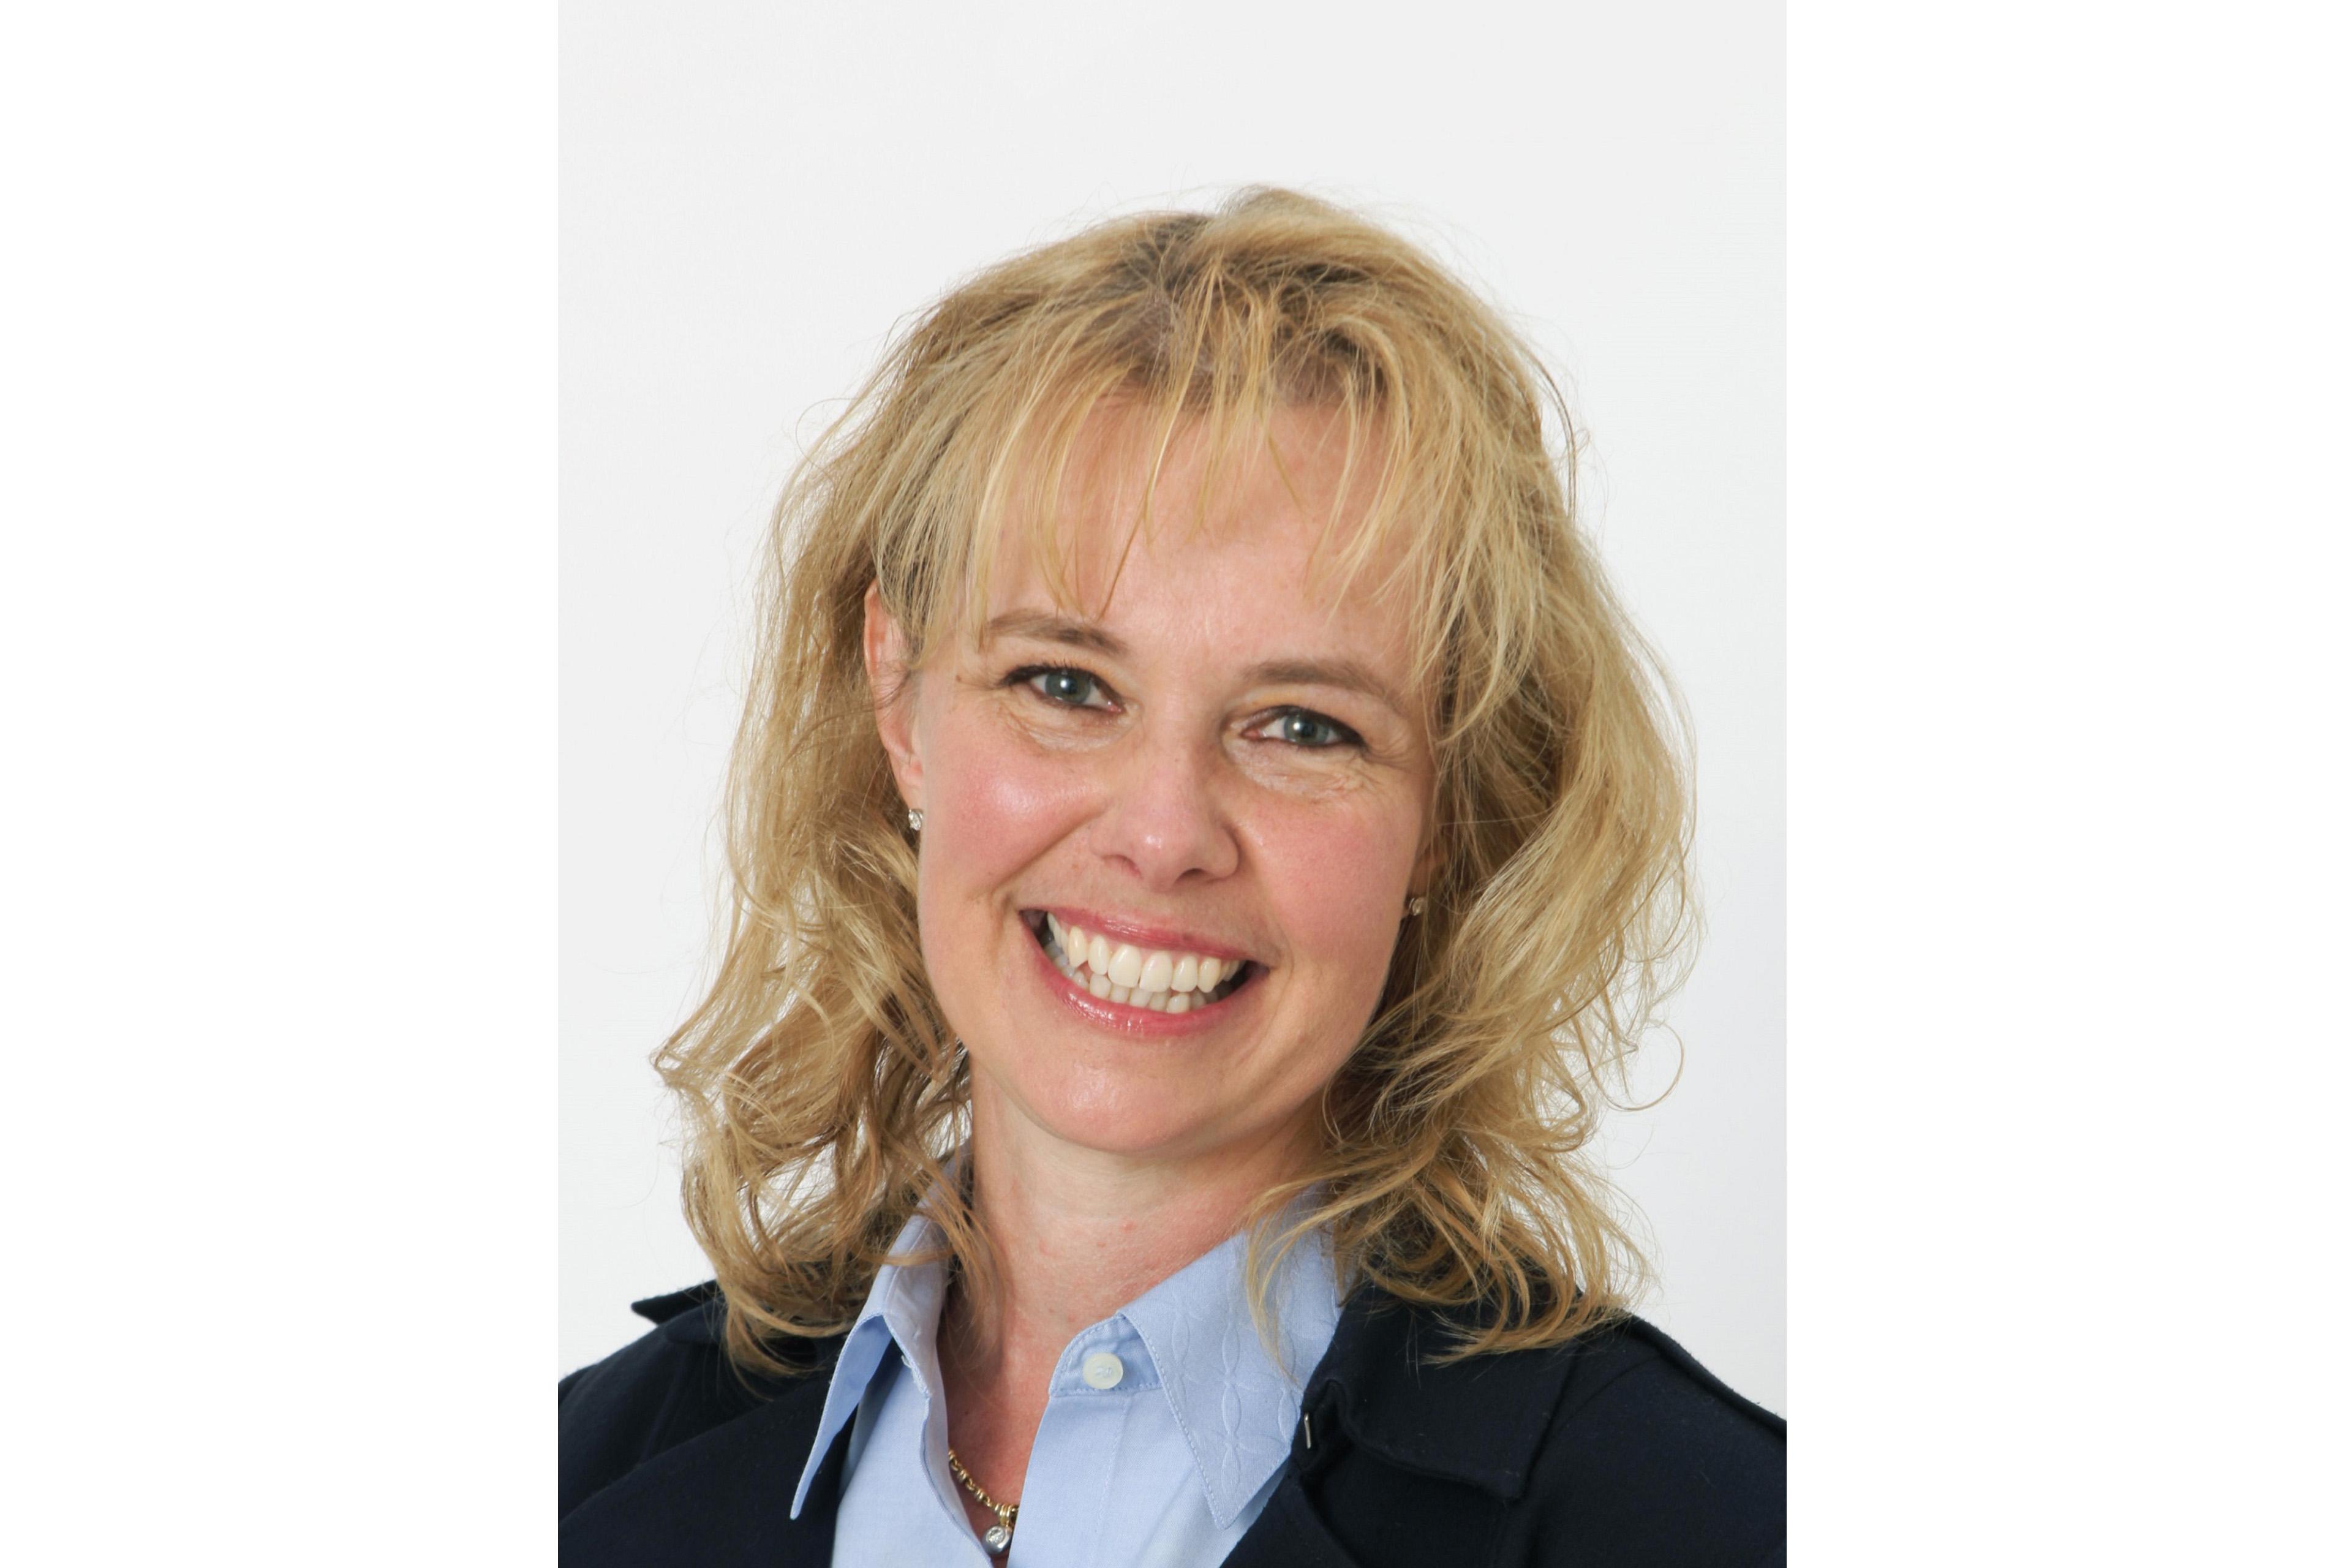 A photographic portrait of Dr. Christina Lampe-Önnerud